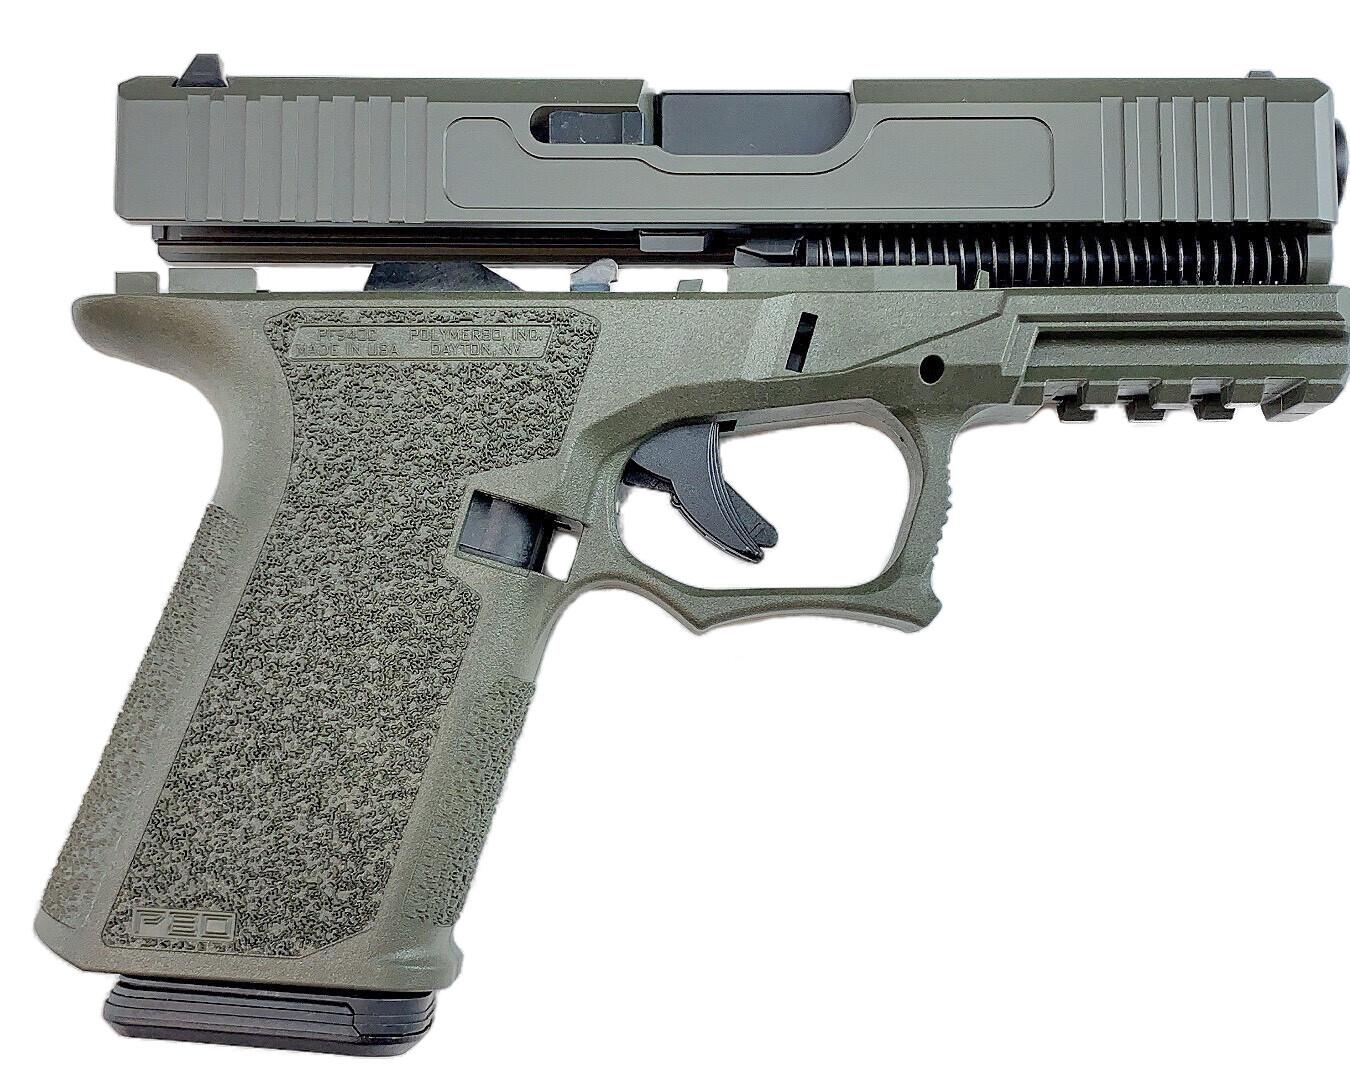 Patriot G19 80% Pistol Build Kit 9mm - Polymer80 PF940C - OD Green - FRAME NOT INCLUDED